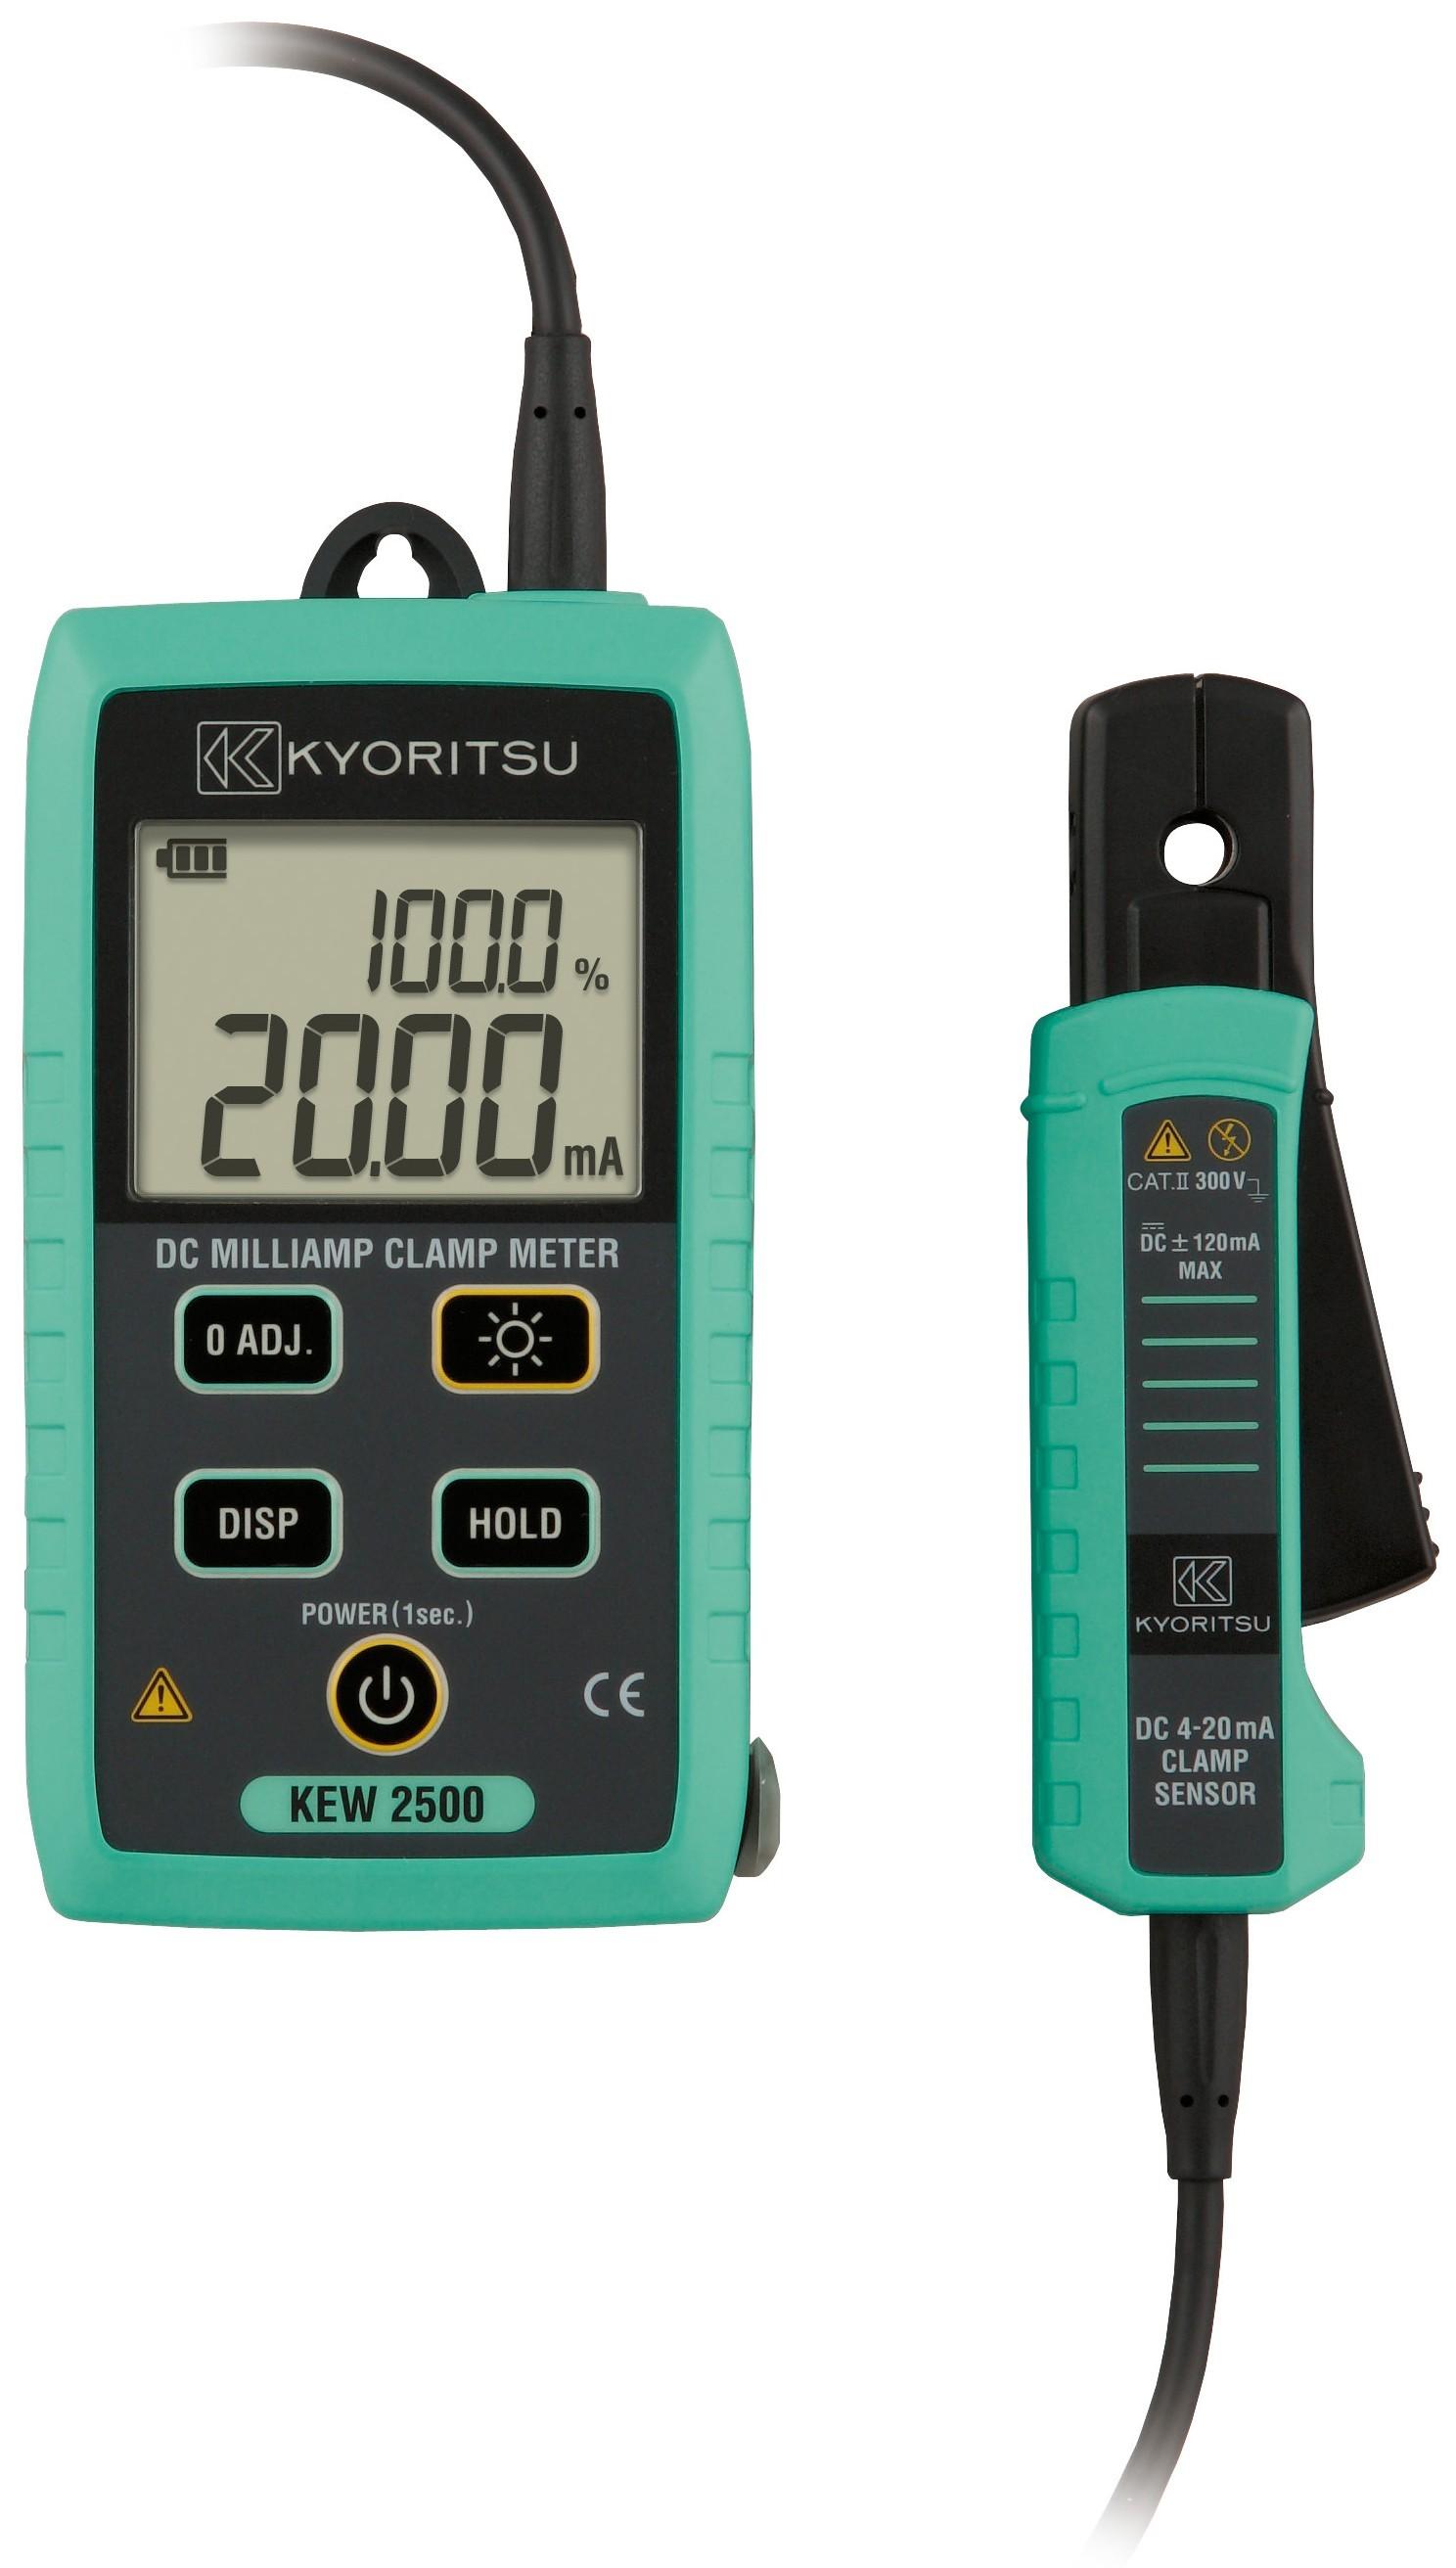 Dc Clamp Meter : Kyoritsu dc milliamp clamp meter test equipment